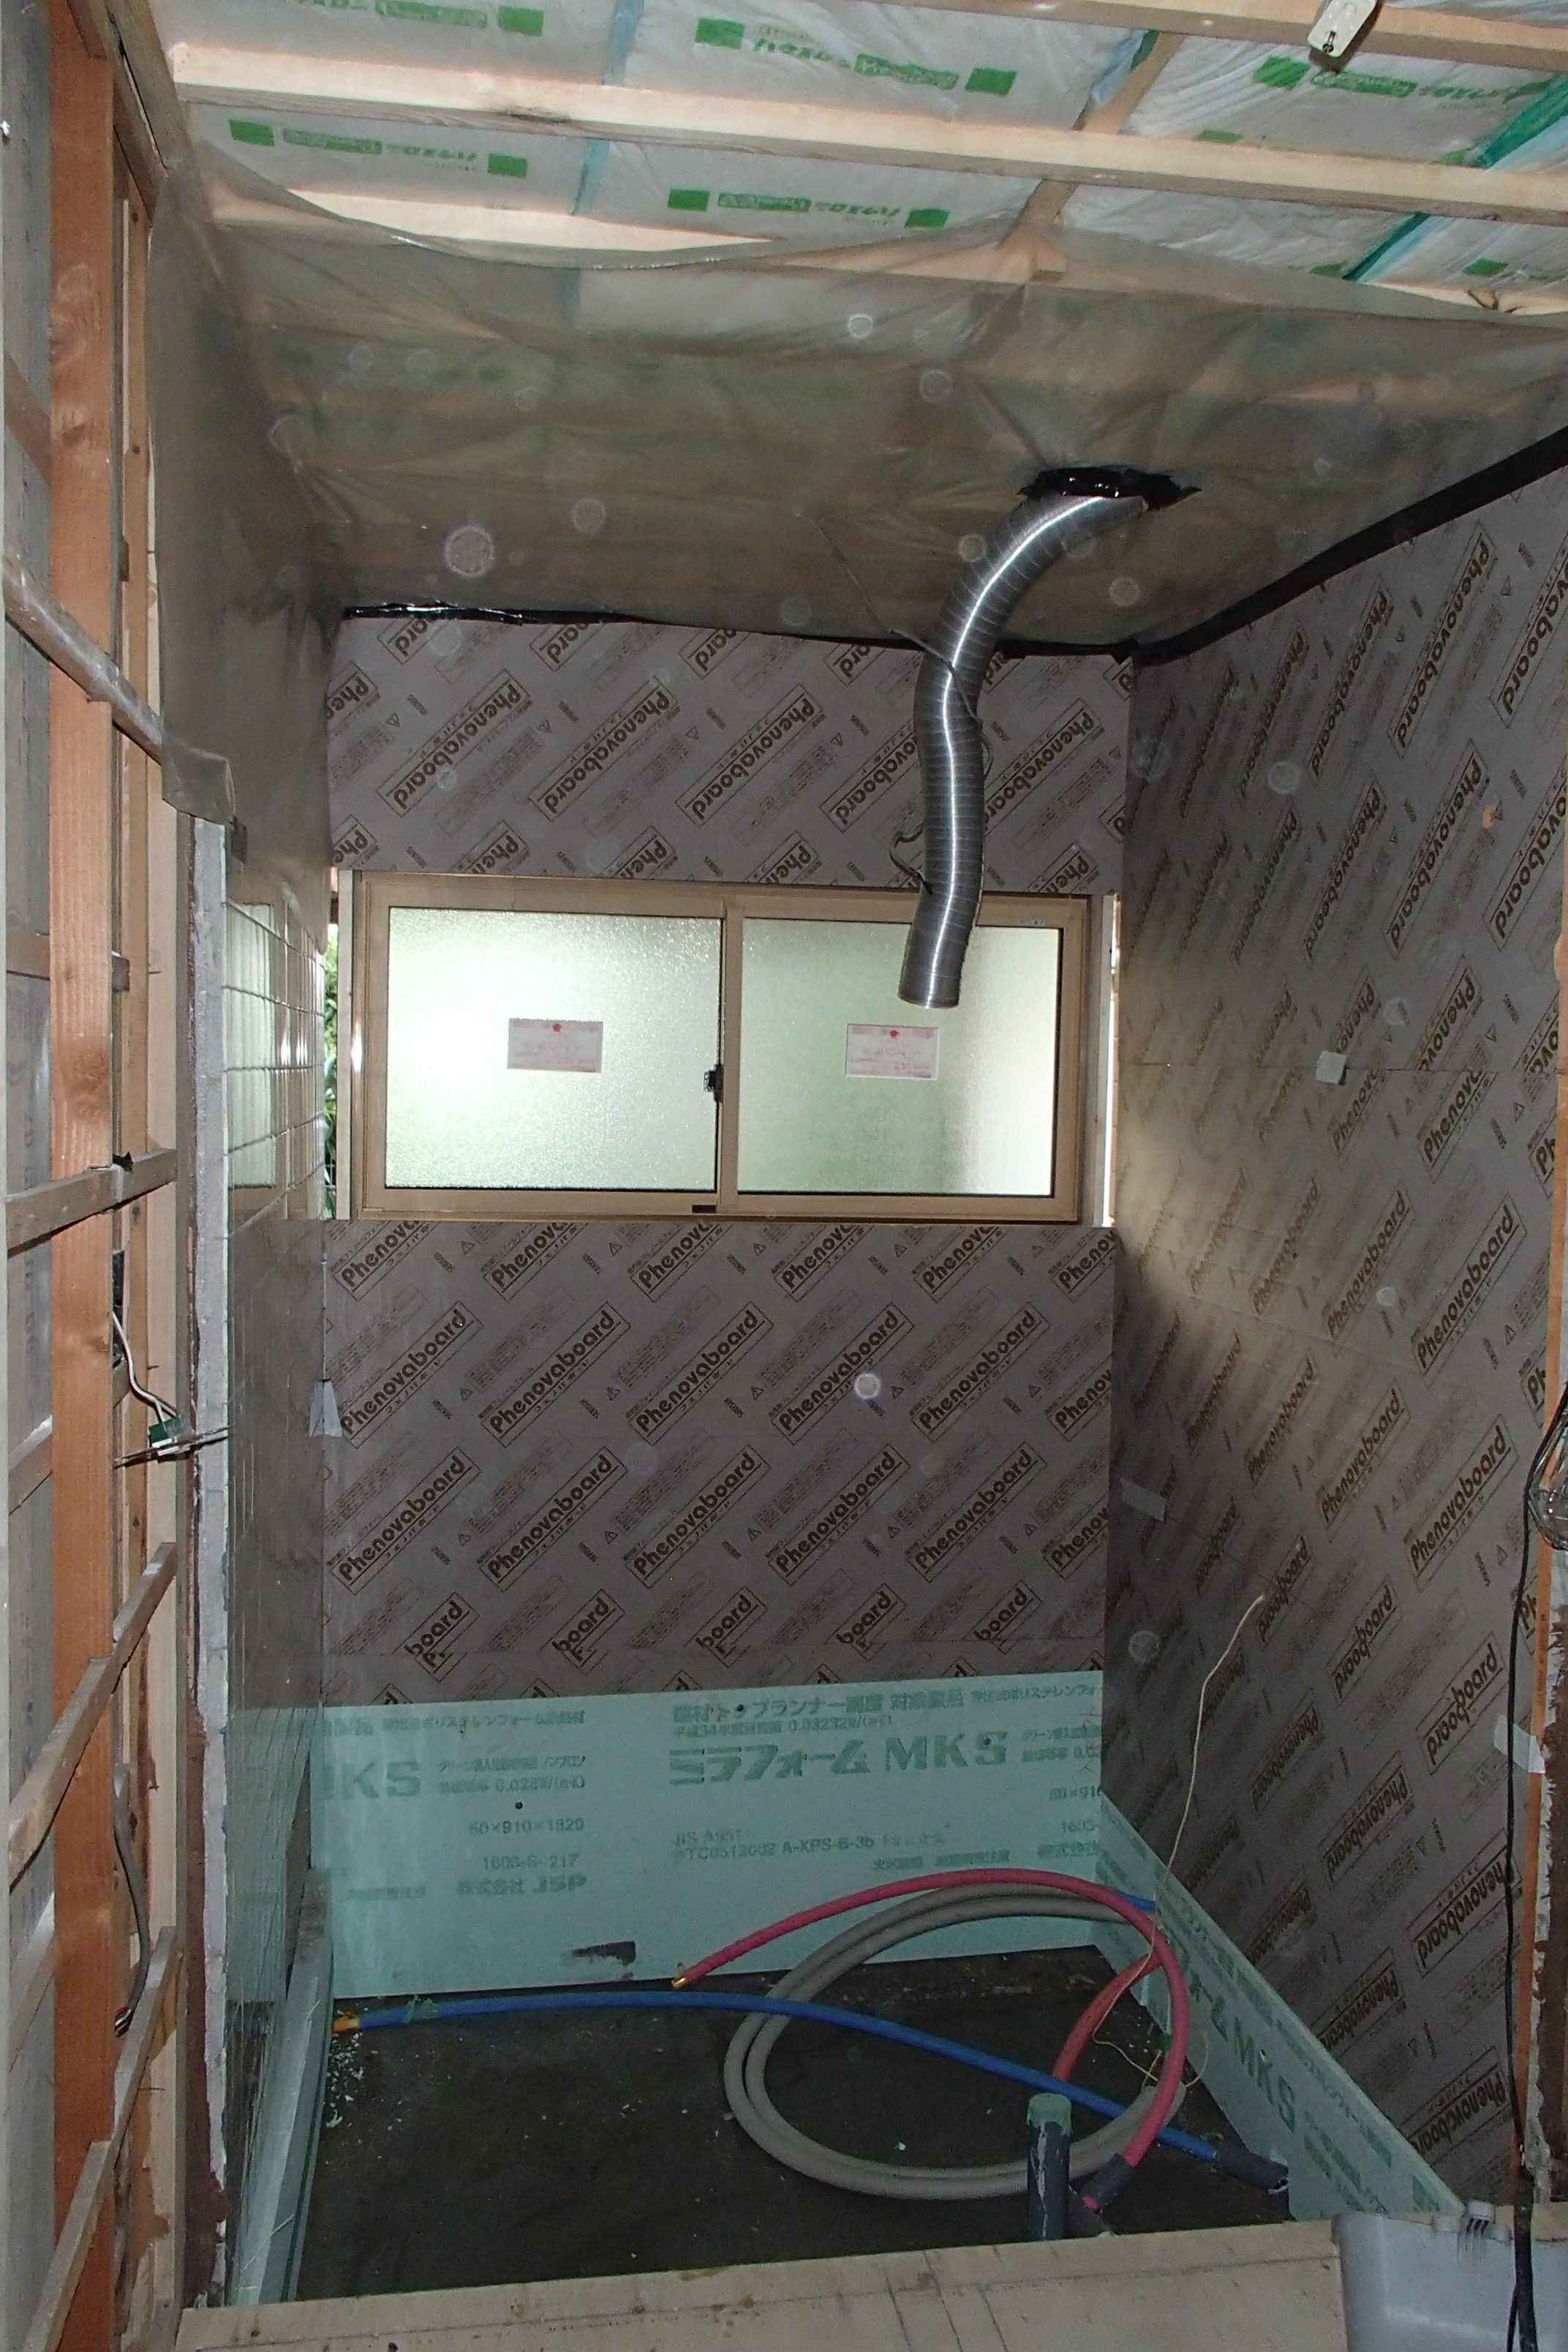 ❸断熱材 天井HGW16k厚200㍉・壁厚90㍉、高基礎部分フェノールフォーム厚20、基礎下部3種b50㍉